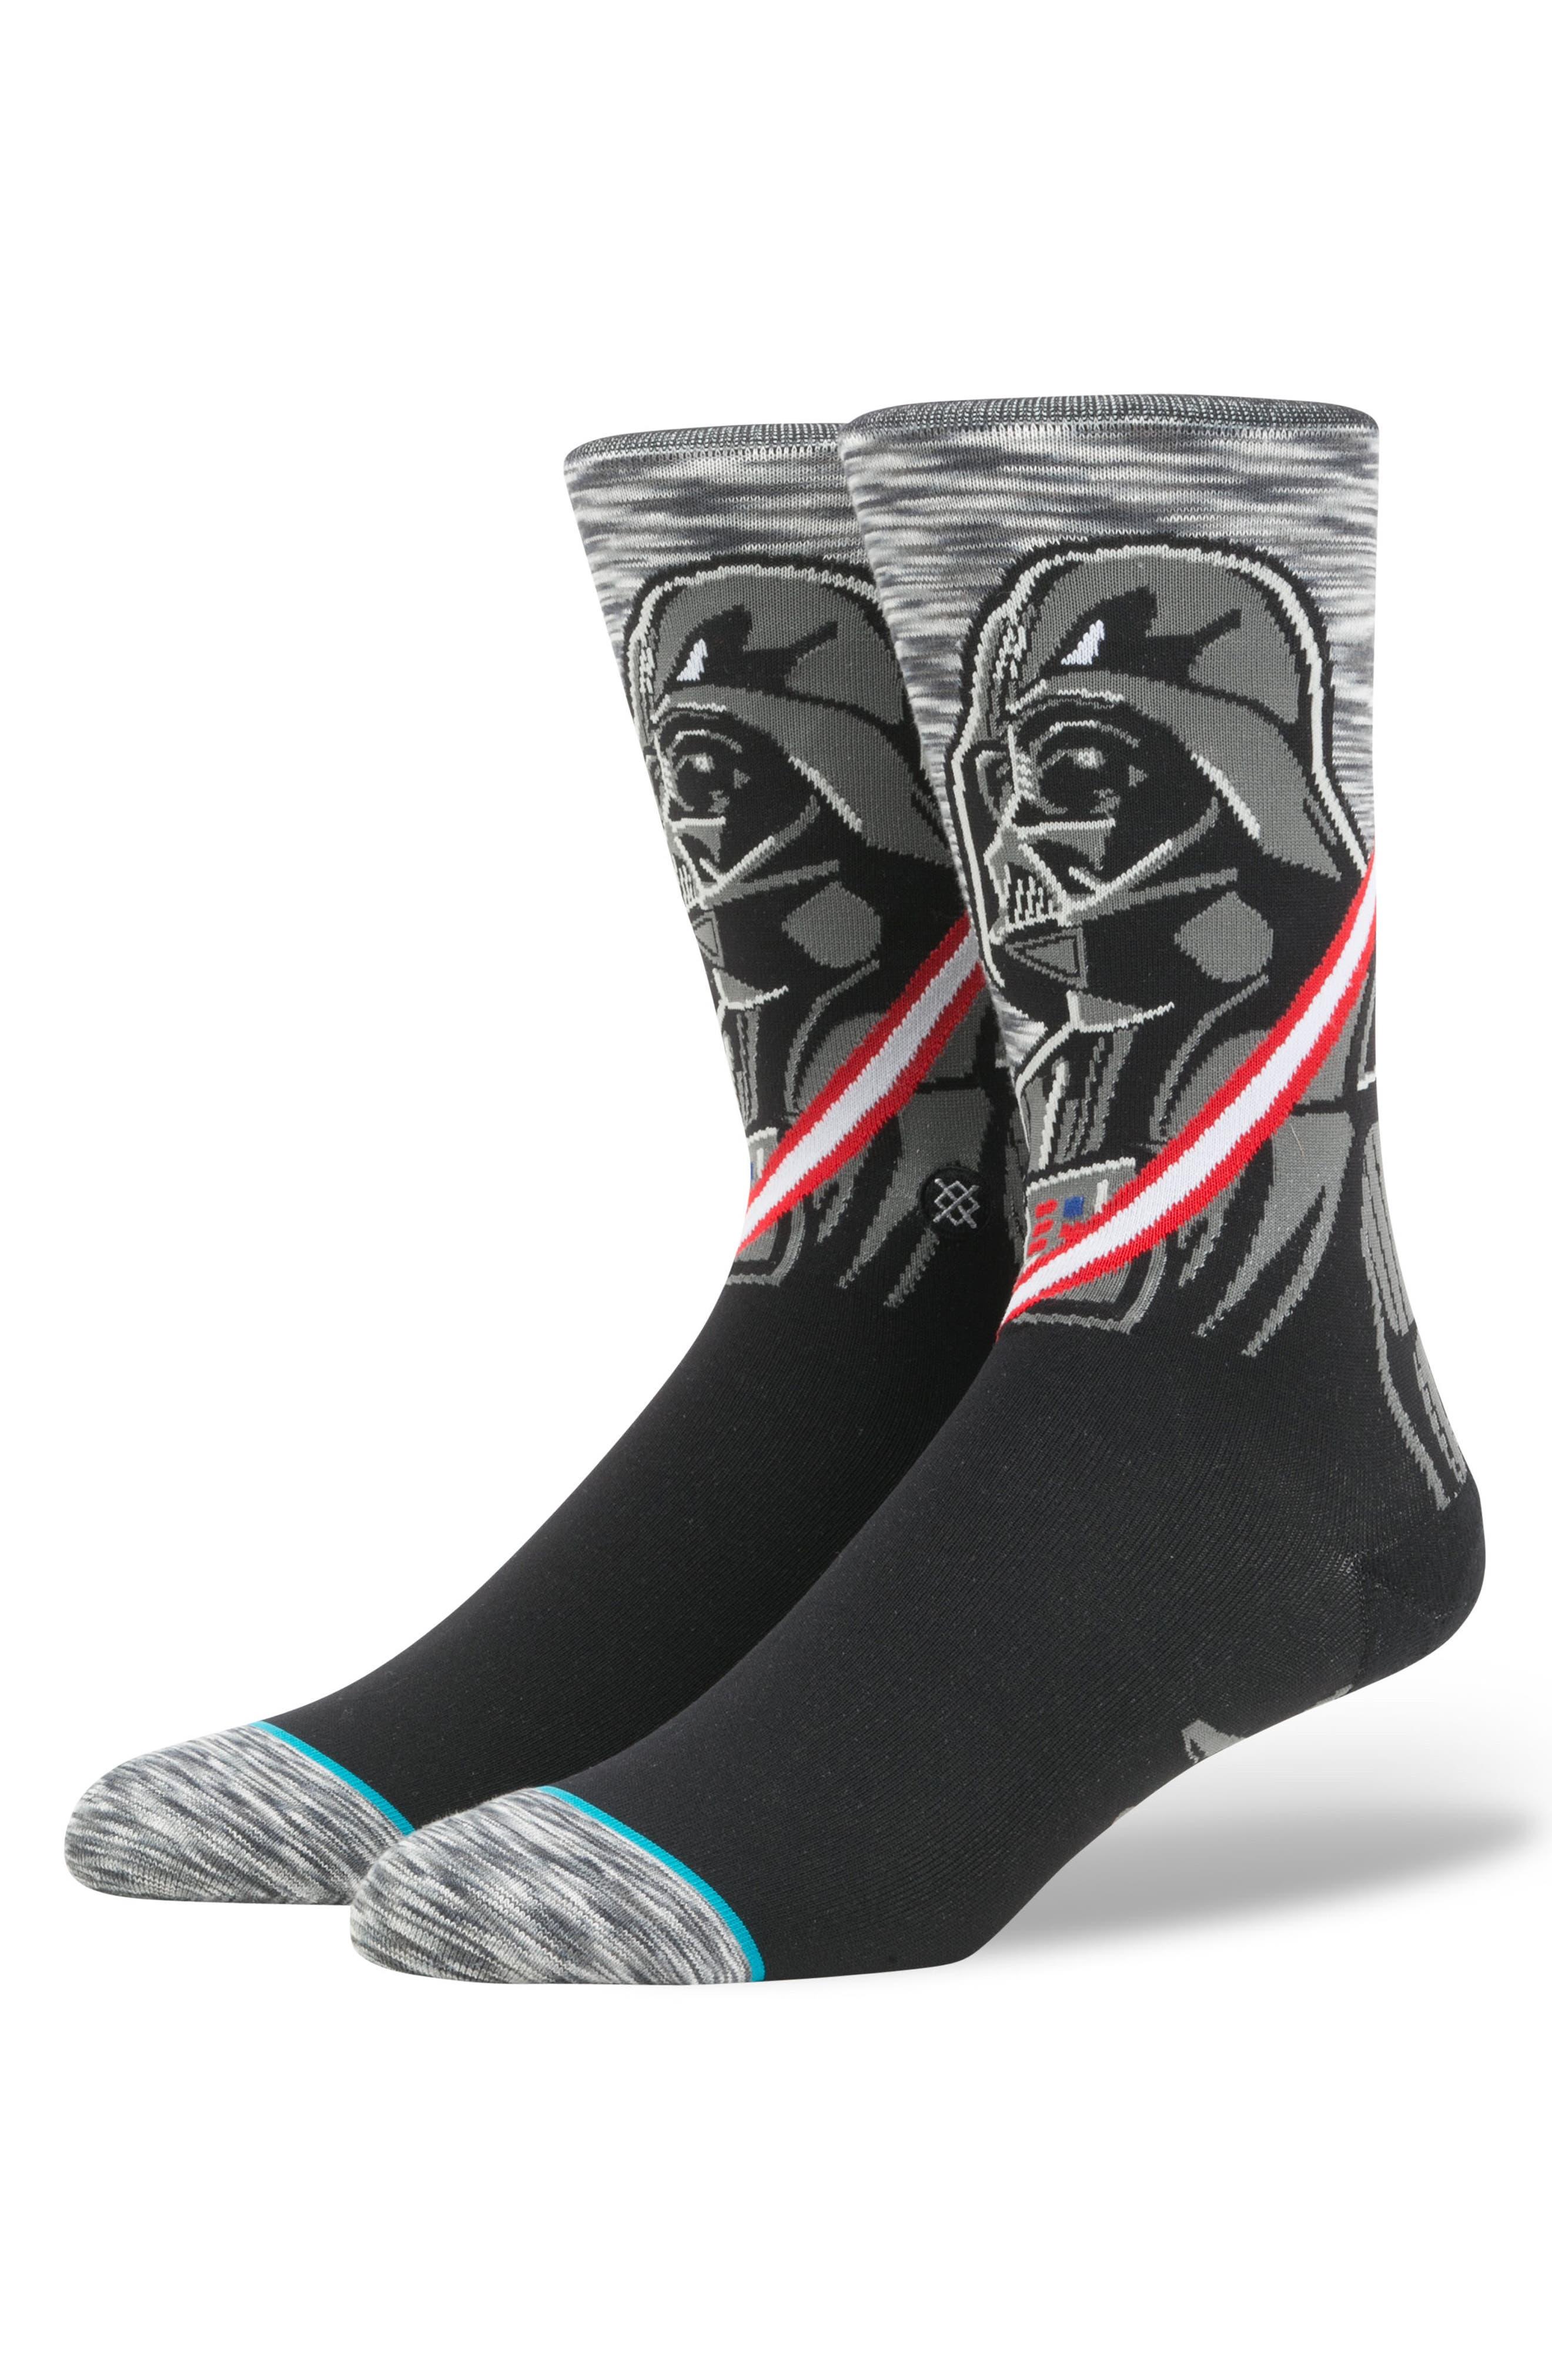 Star Wars<sup>™</sup> - Darkside Socks,                         Main,                         color, Grey